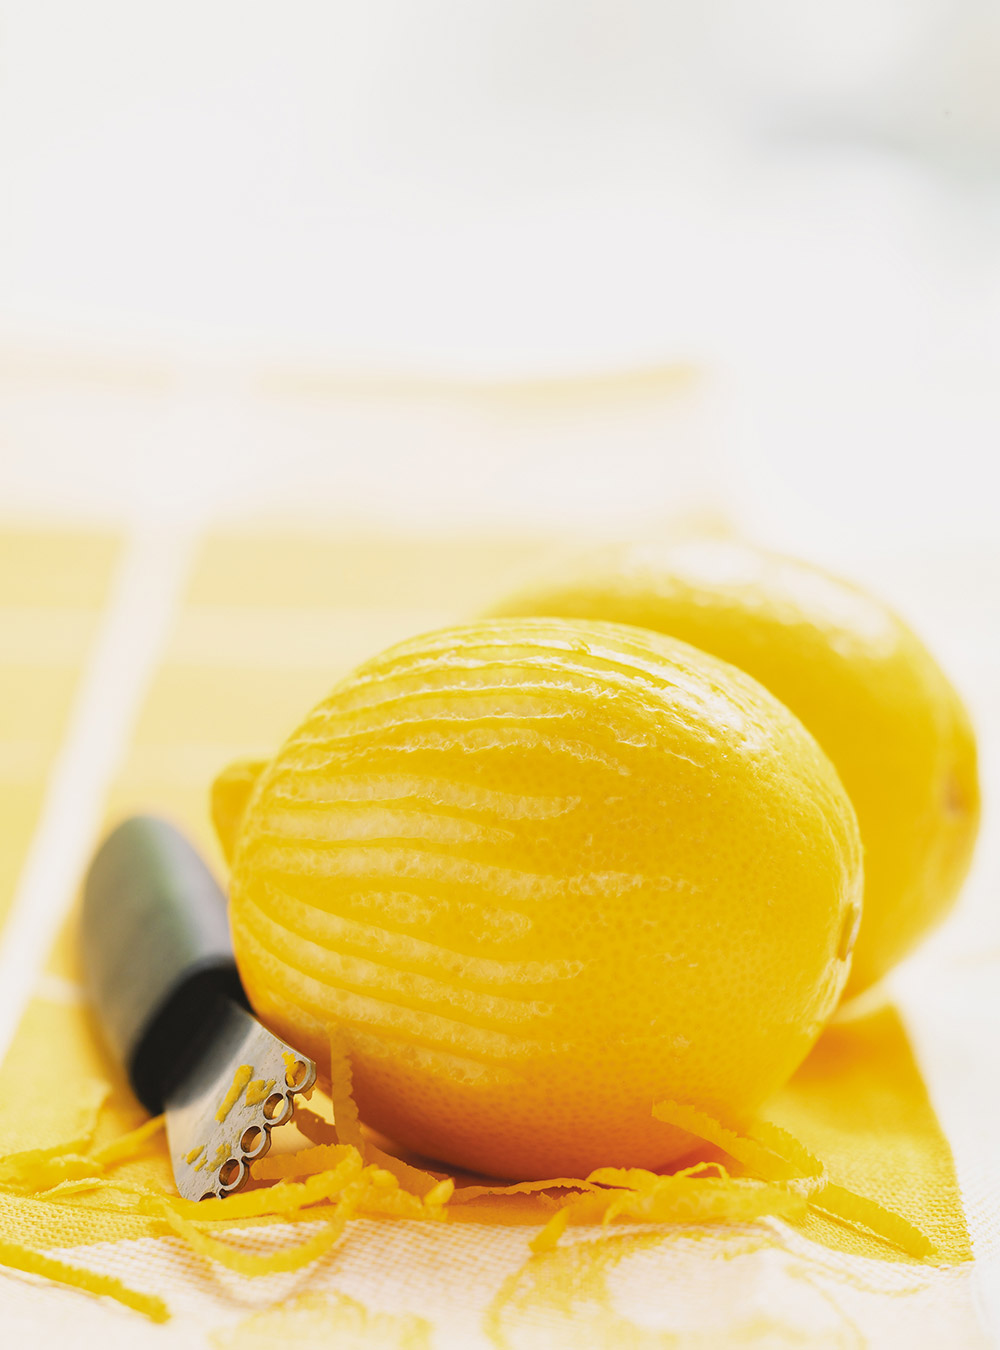 Bavette de boeuf et tartinade de fromage feta   ricardo